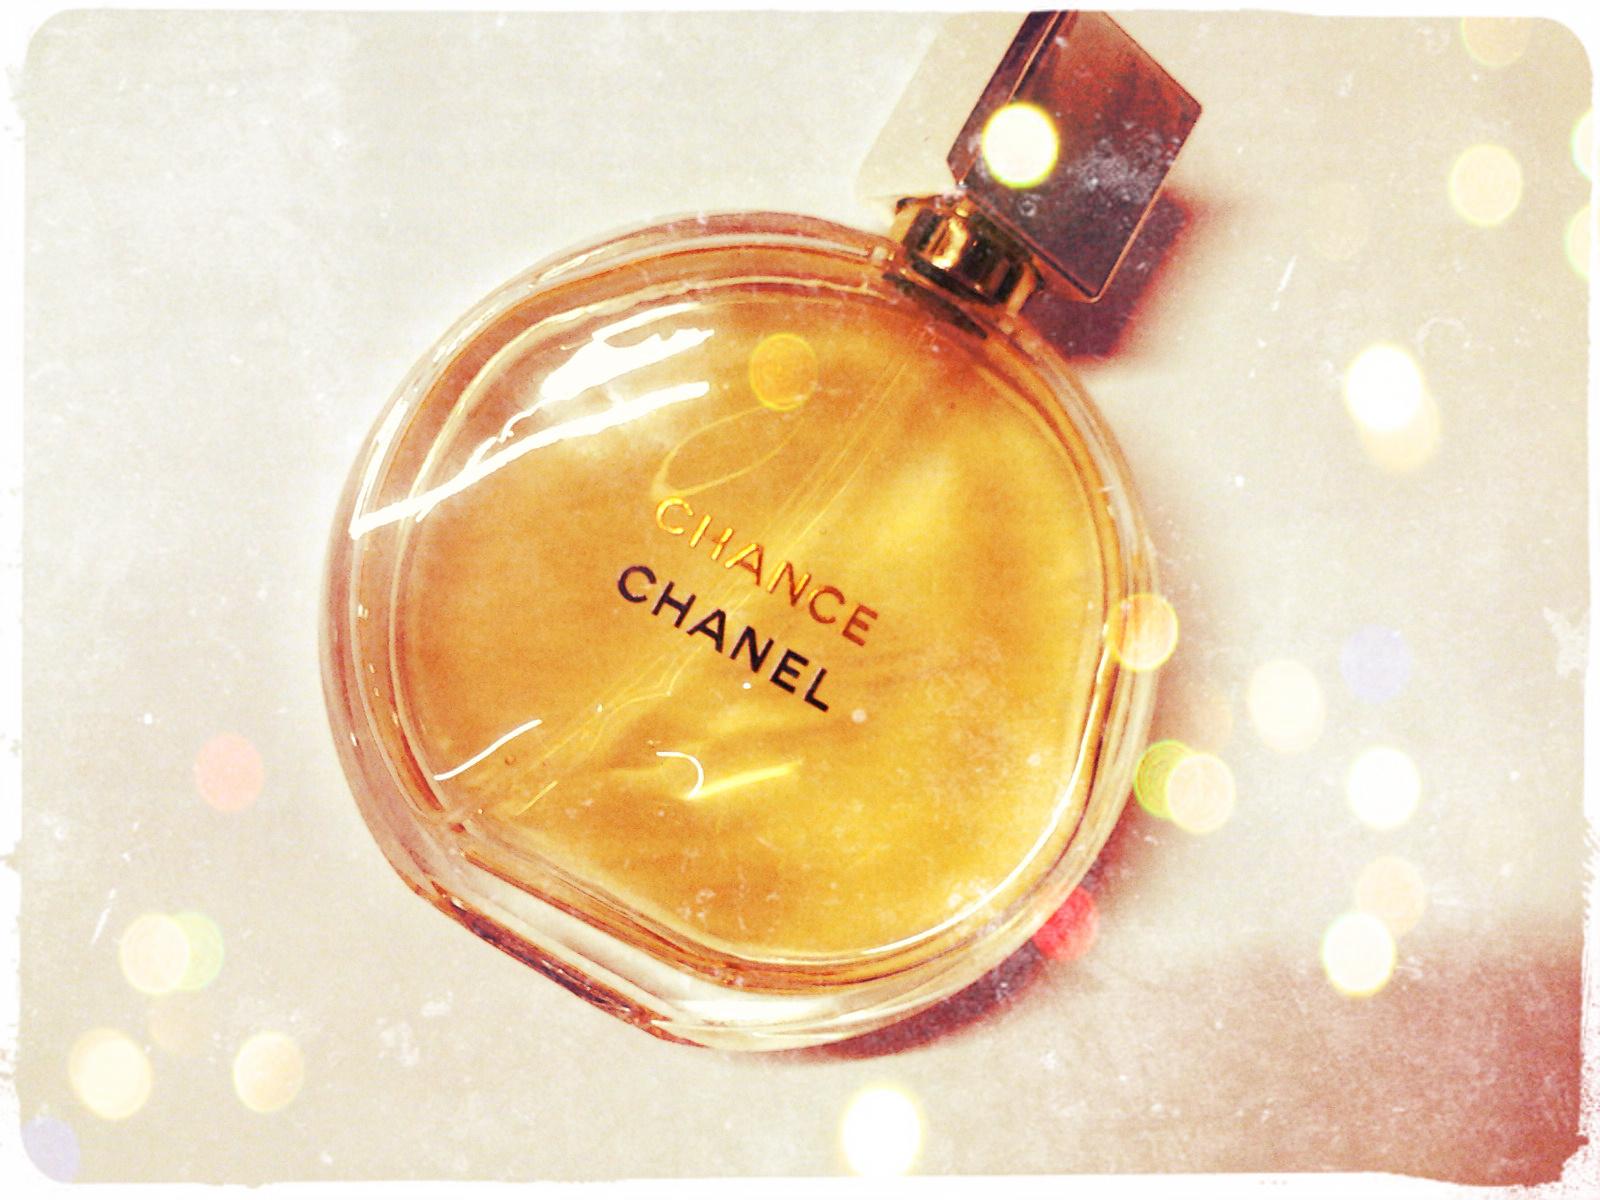 Perfume Chance, da Chanel - por Thiago Fonseca